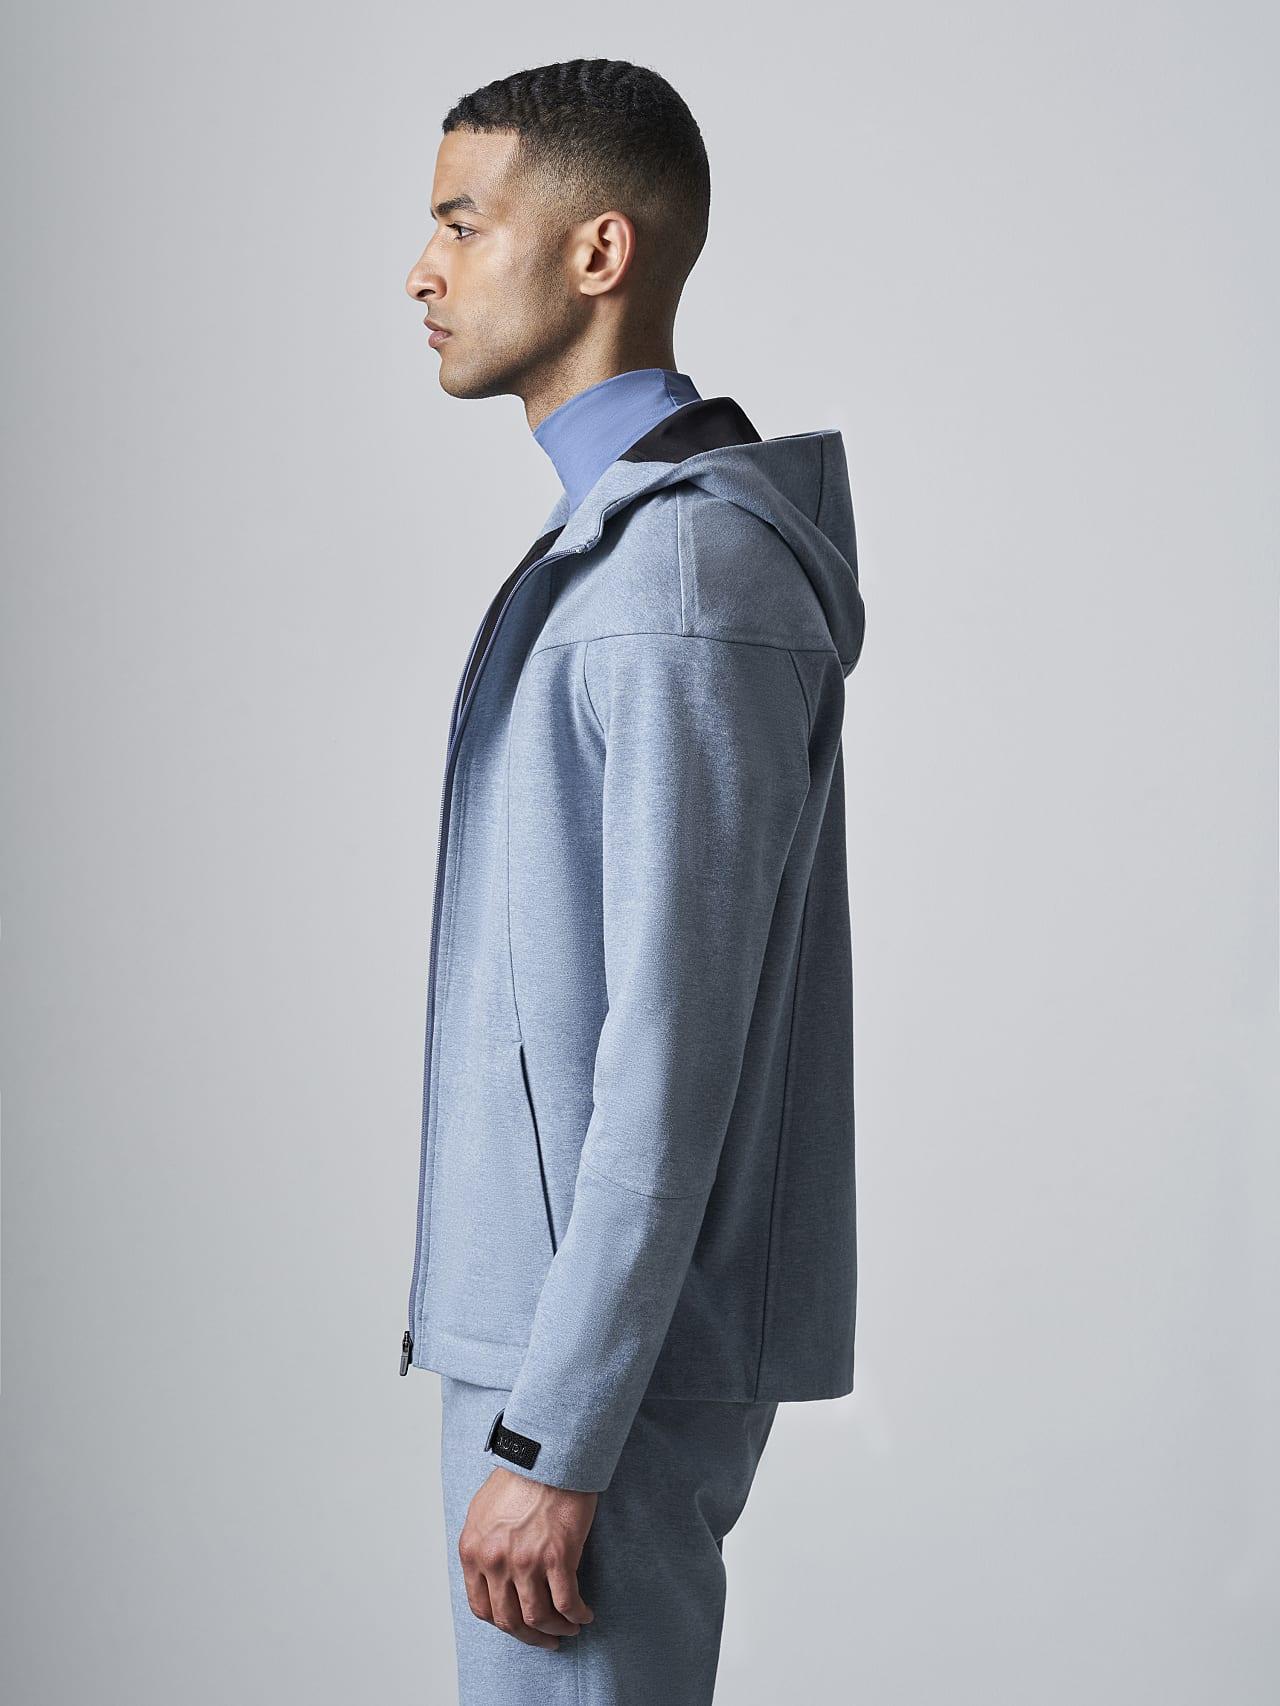 SROTE V1.Y5.02 Waterproof Sweatjacket medium blue Extra Alpha Tauri